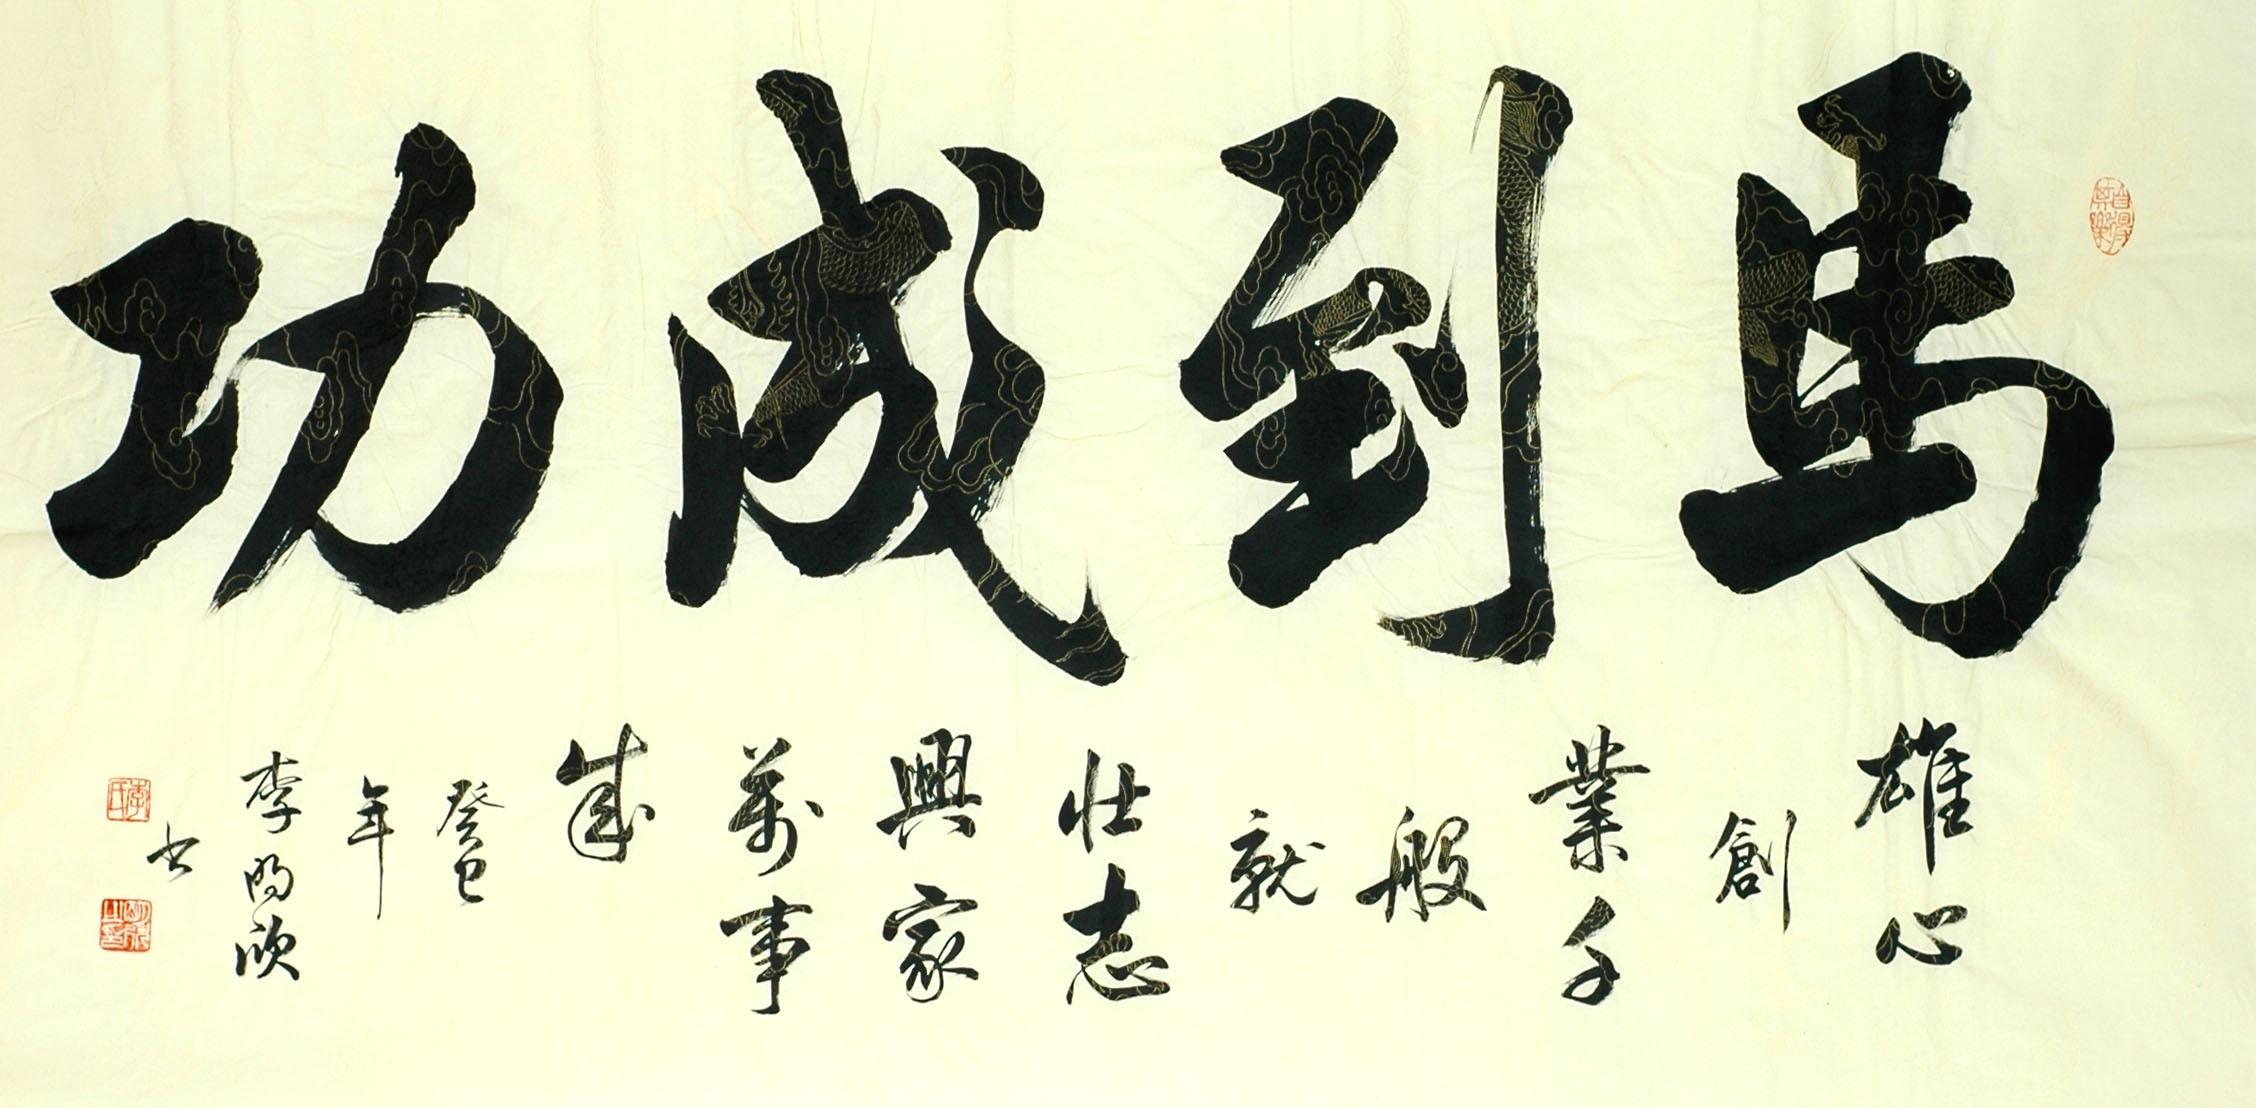 Chinese Cursive Scripts Painting - CNAG013408